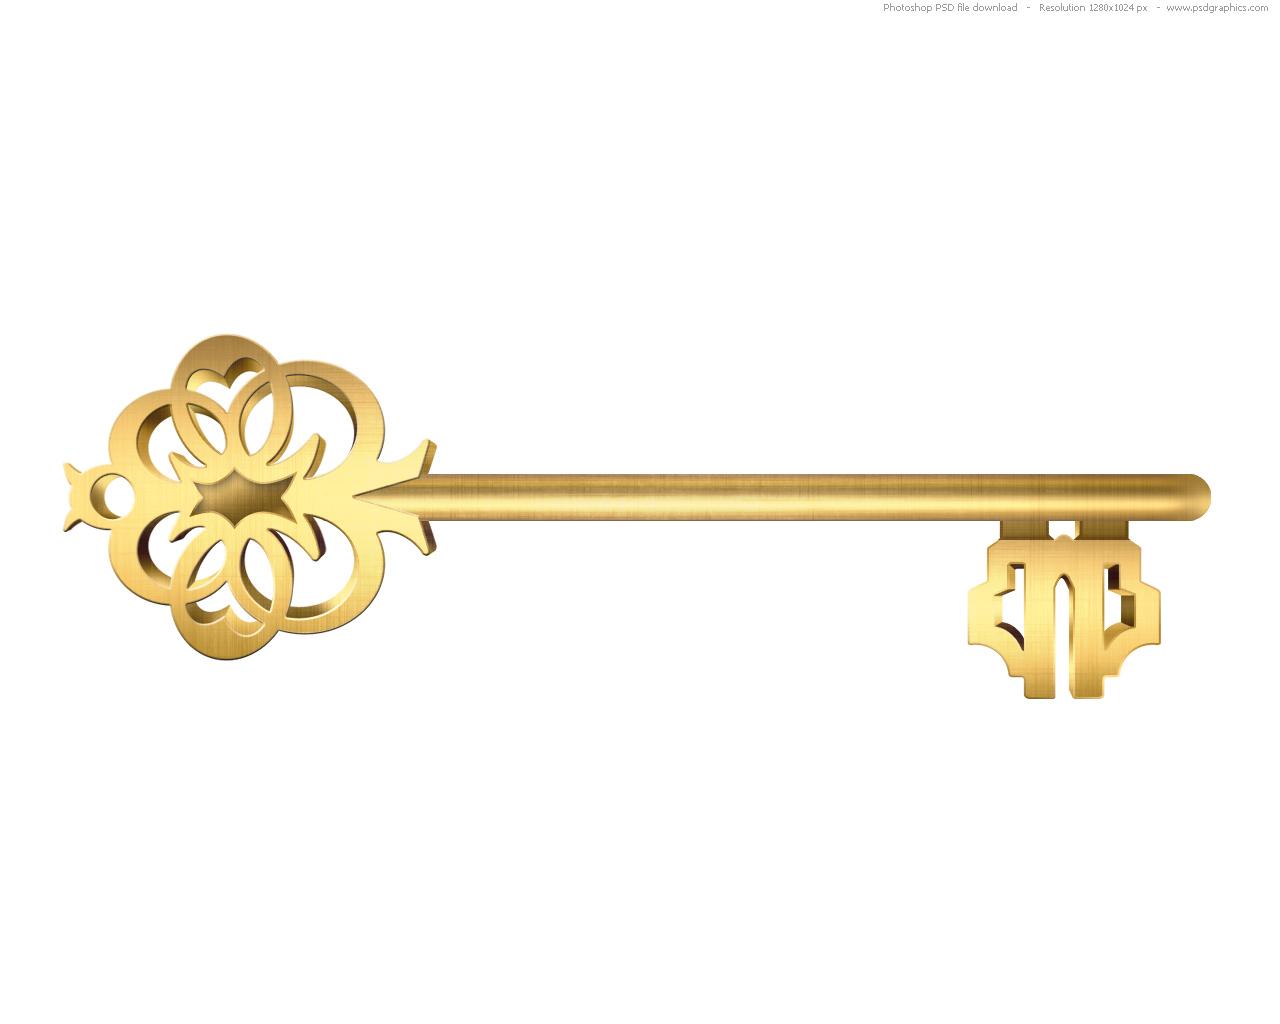 Member's Key